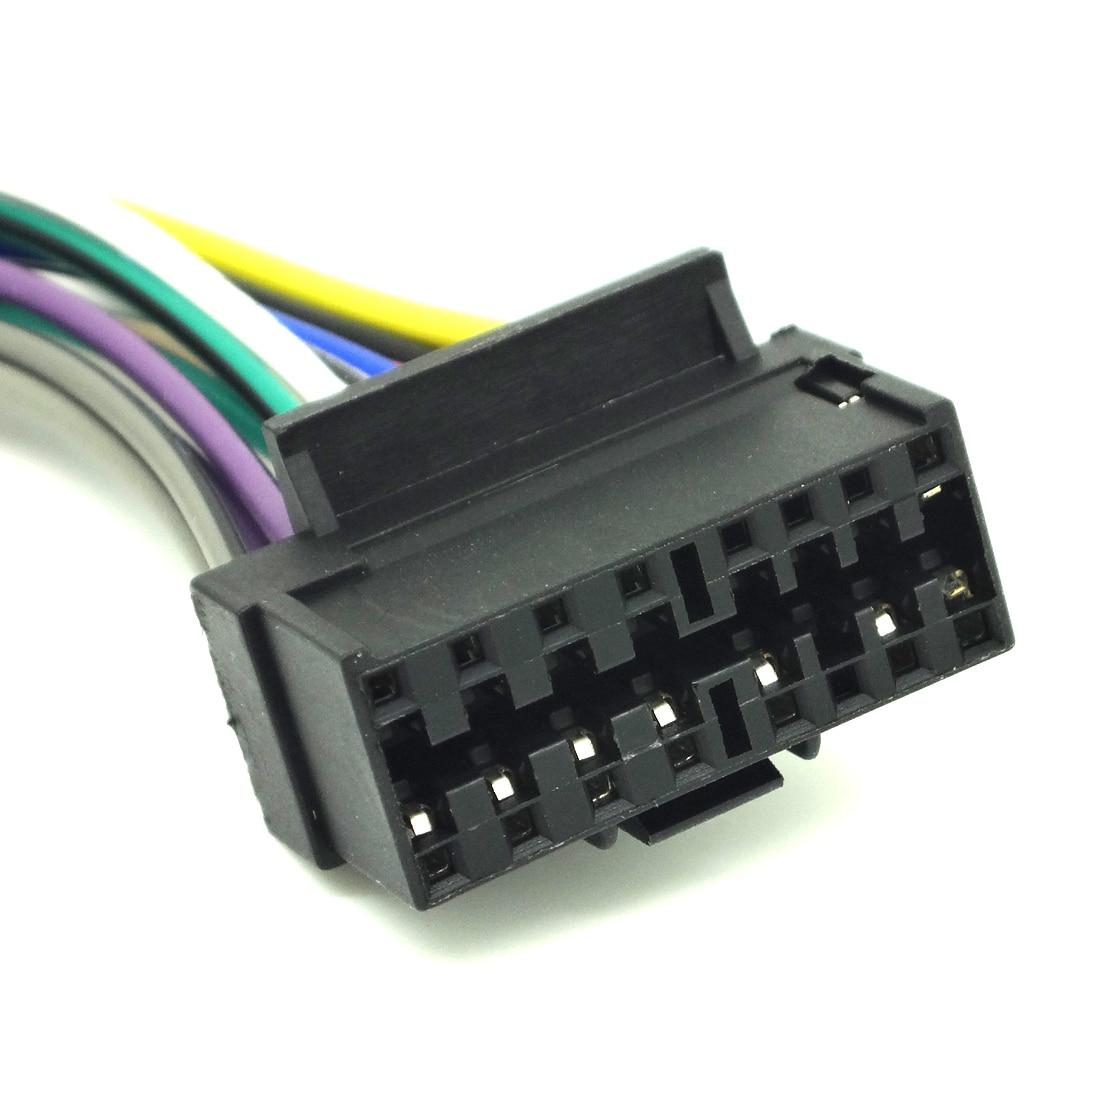 Jvc wiring diagram trusted wiring diagram wiring harness diagram car stereo  pin wiring diagram jpg 1100x1100